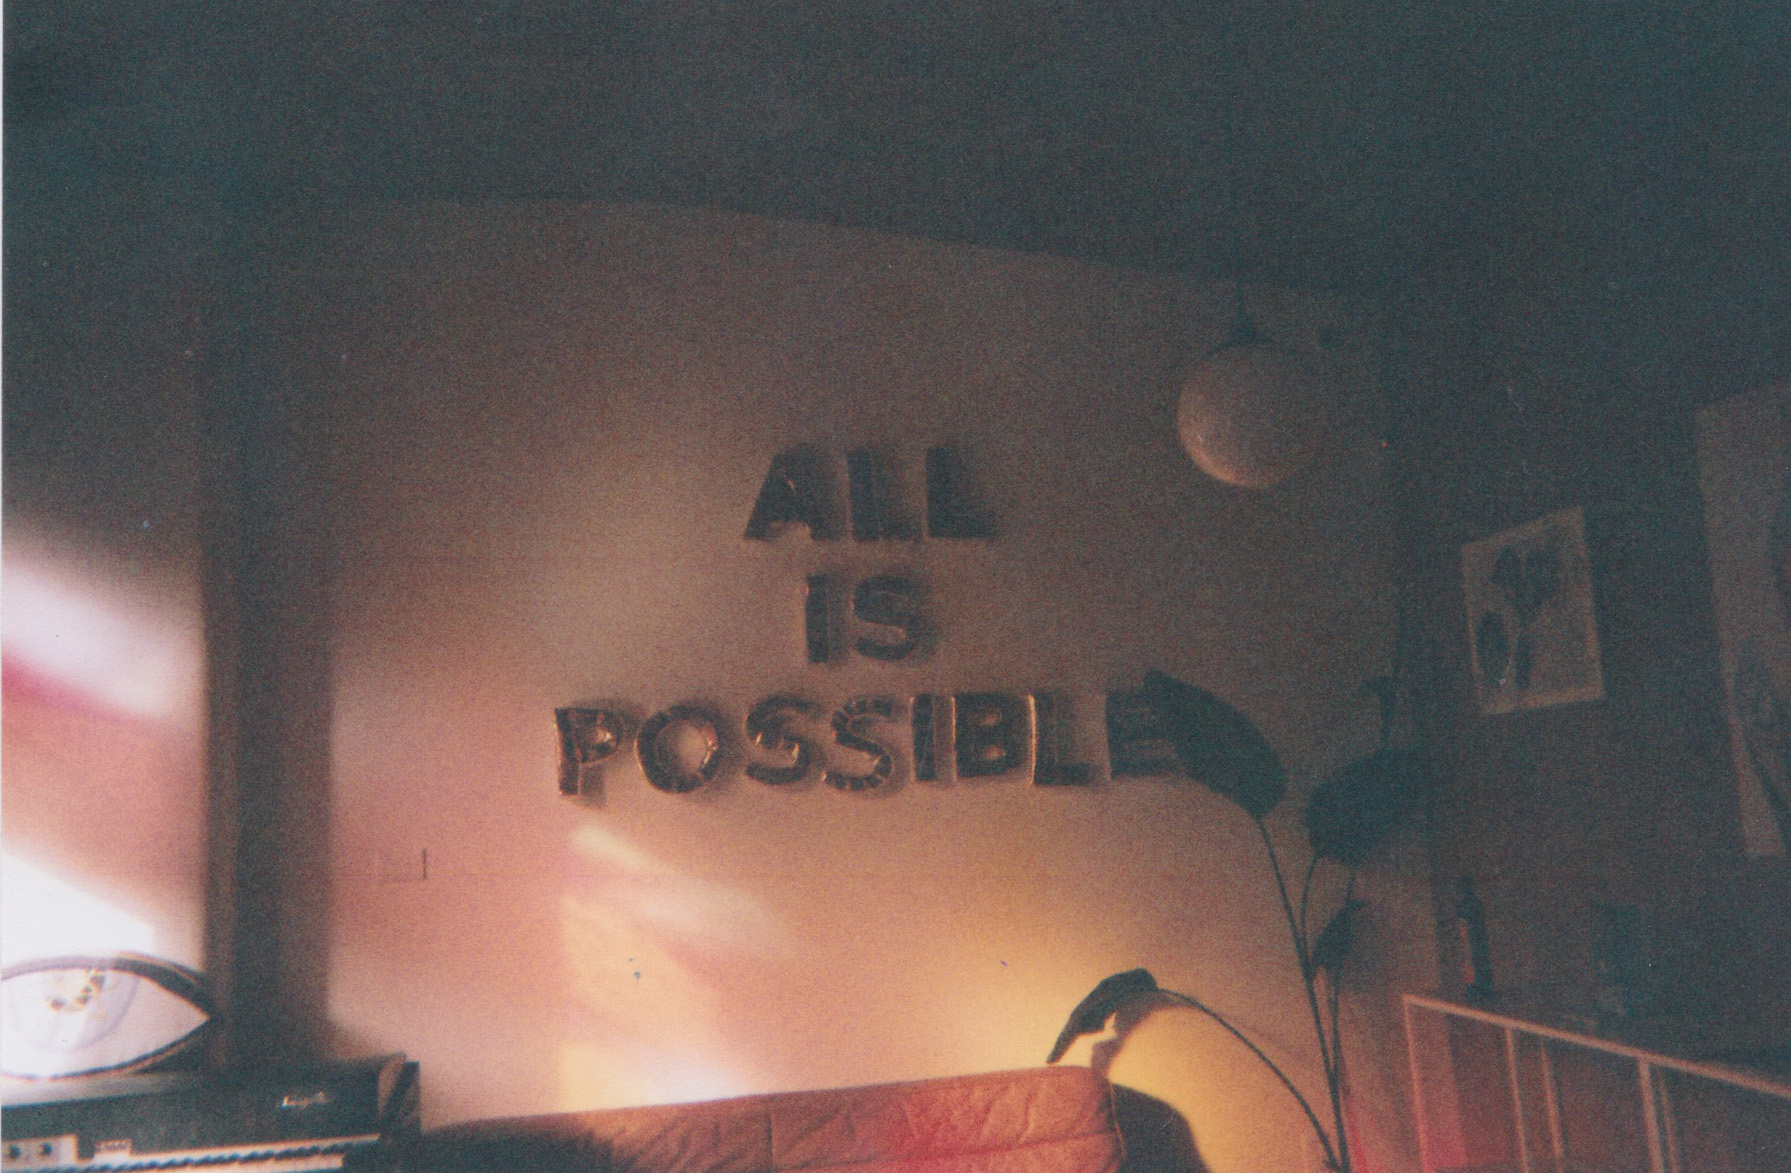 AllisPossible.jpg